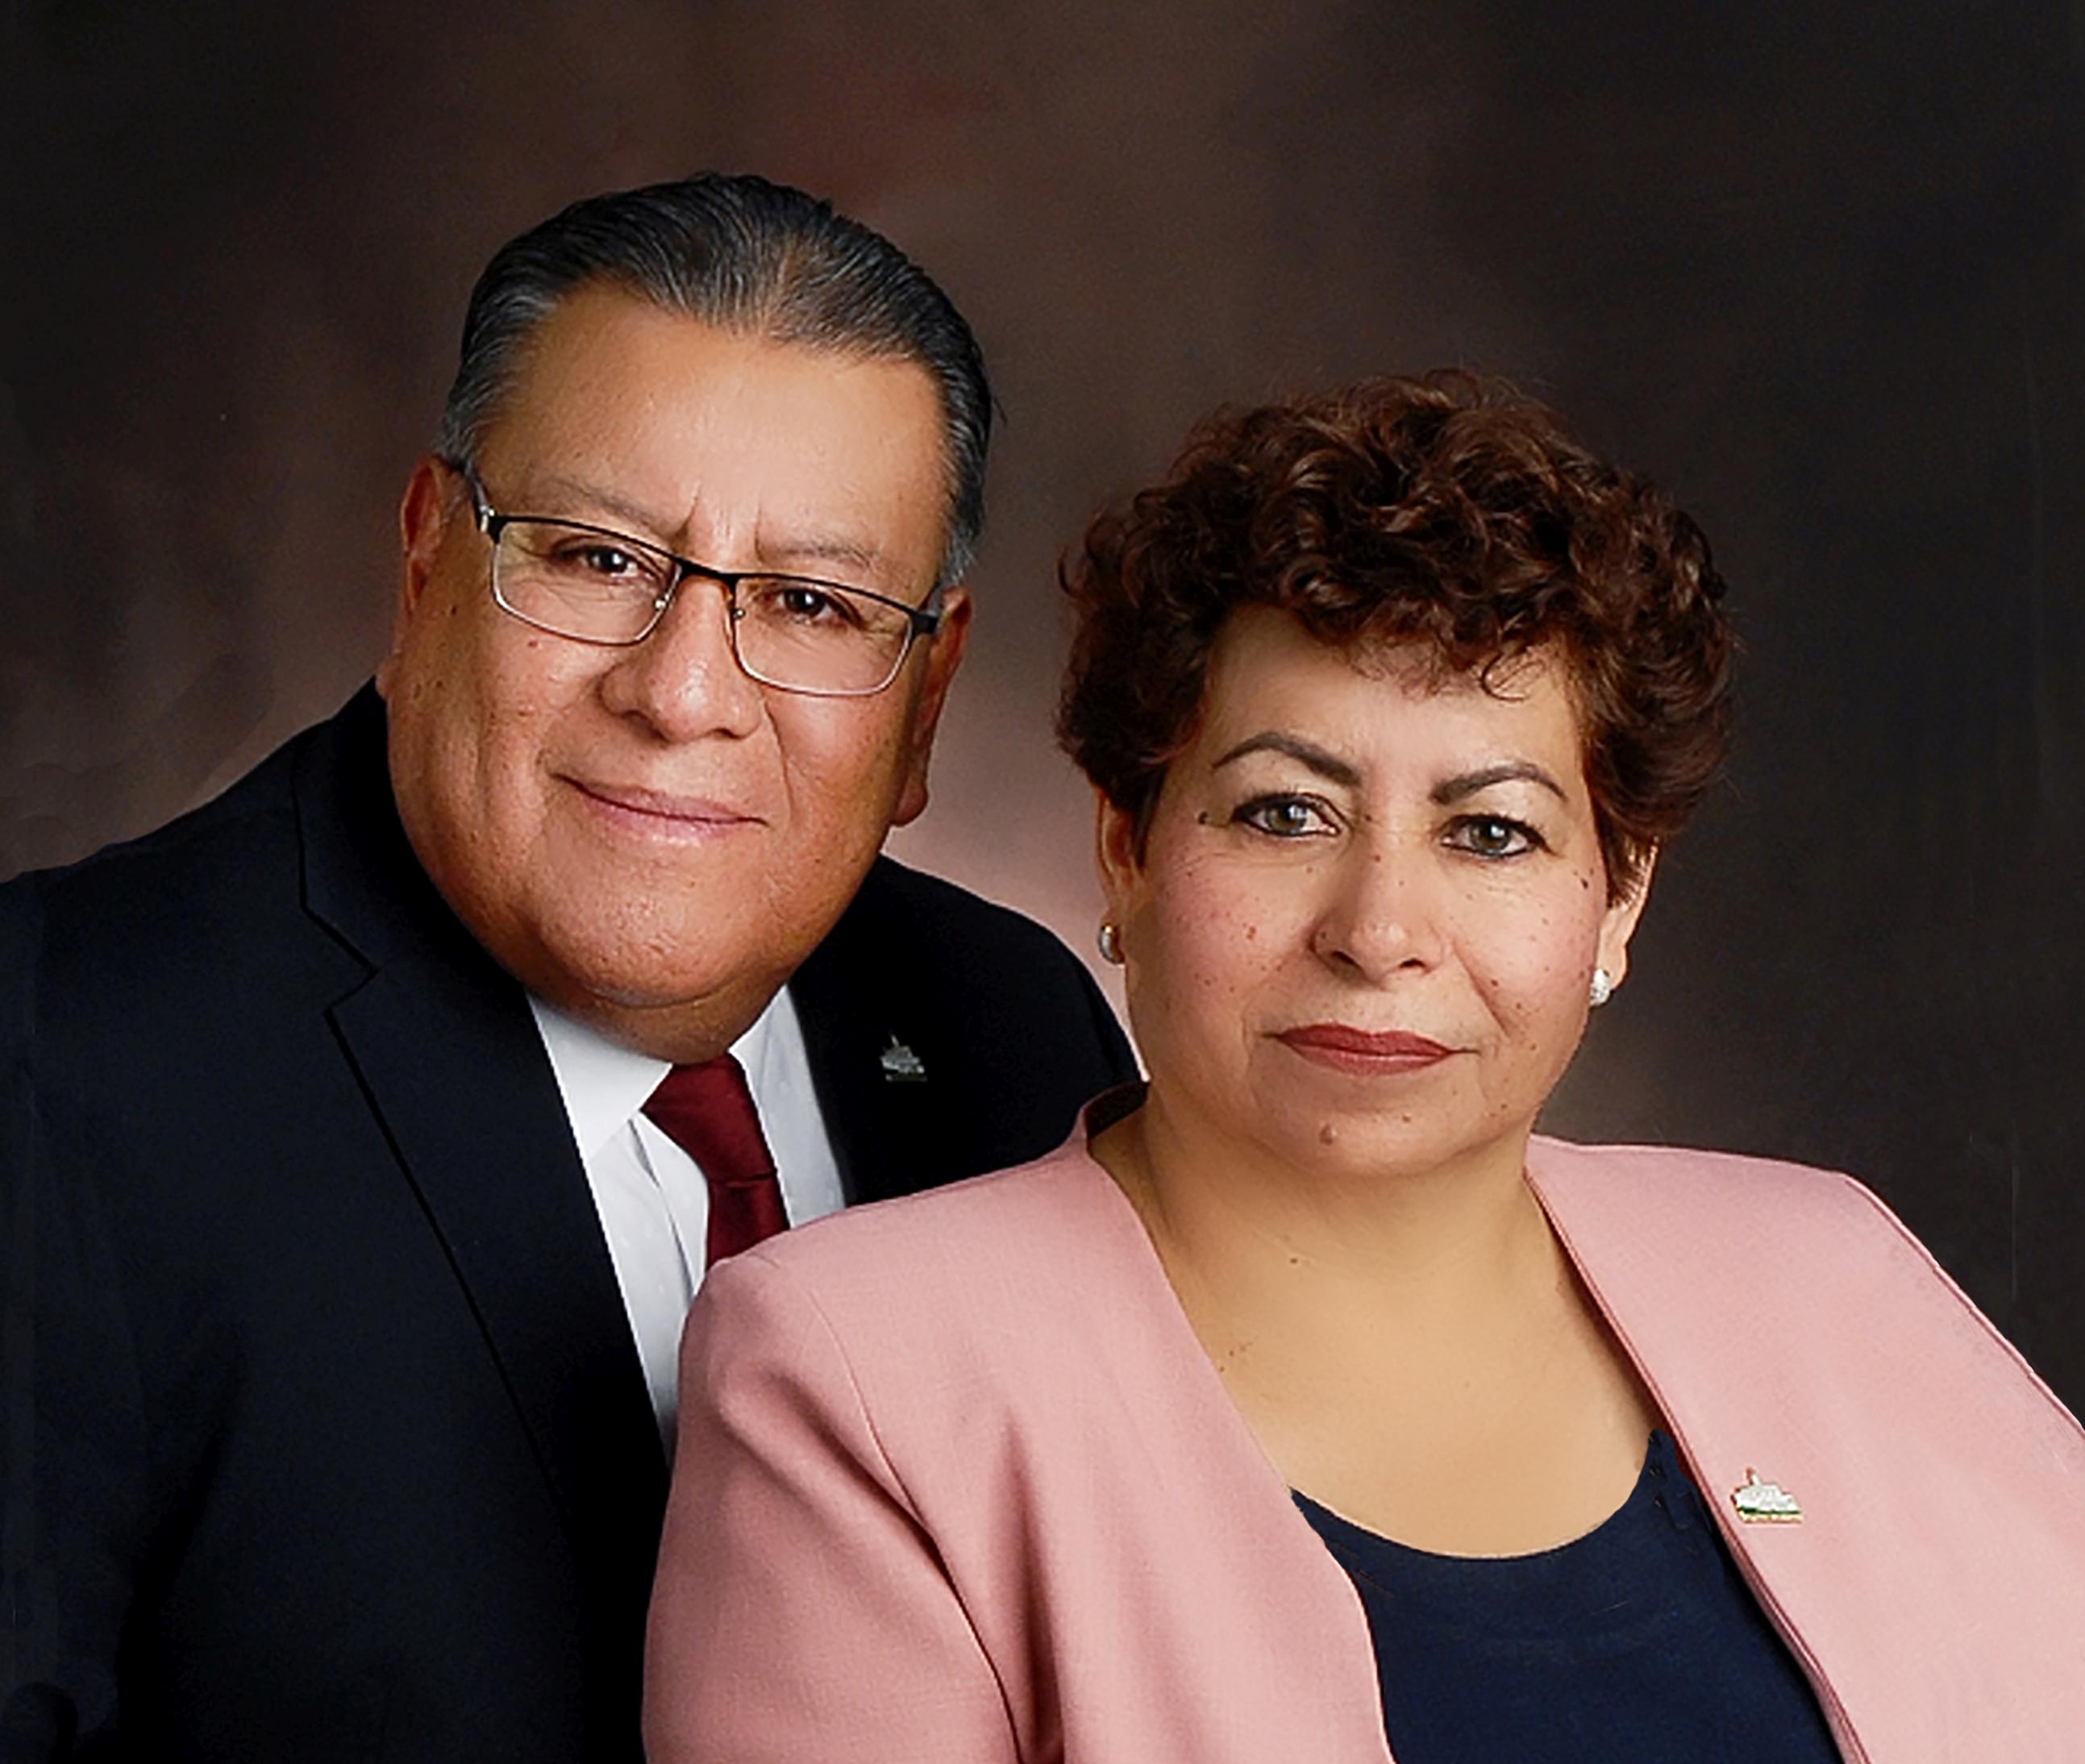 A. David and María C. Vázquez